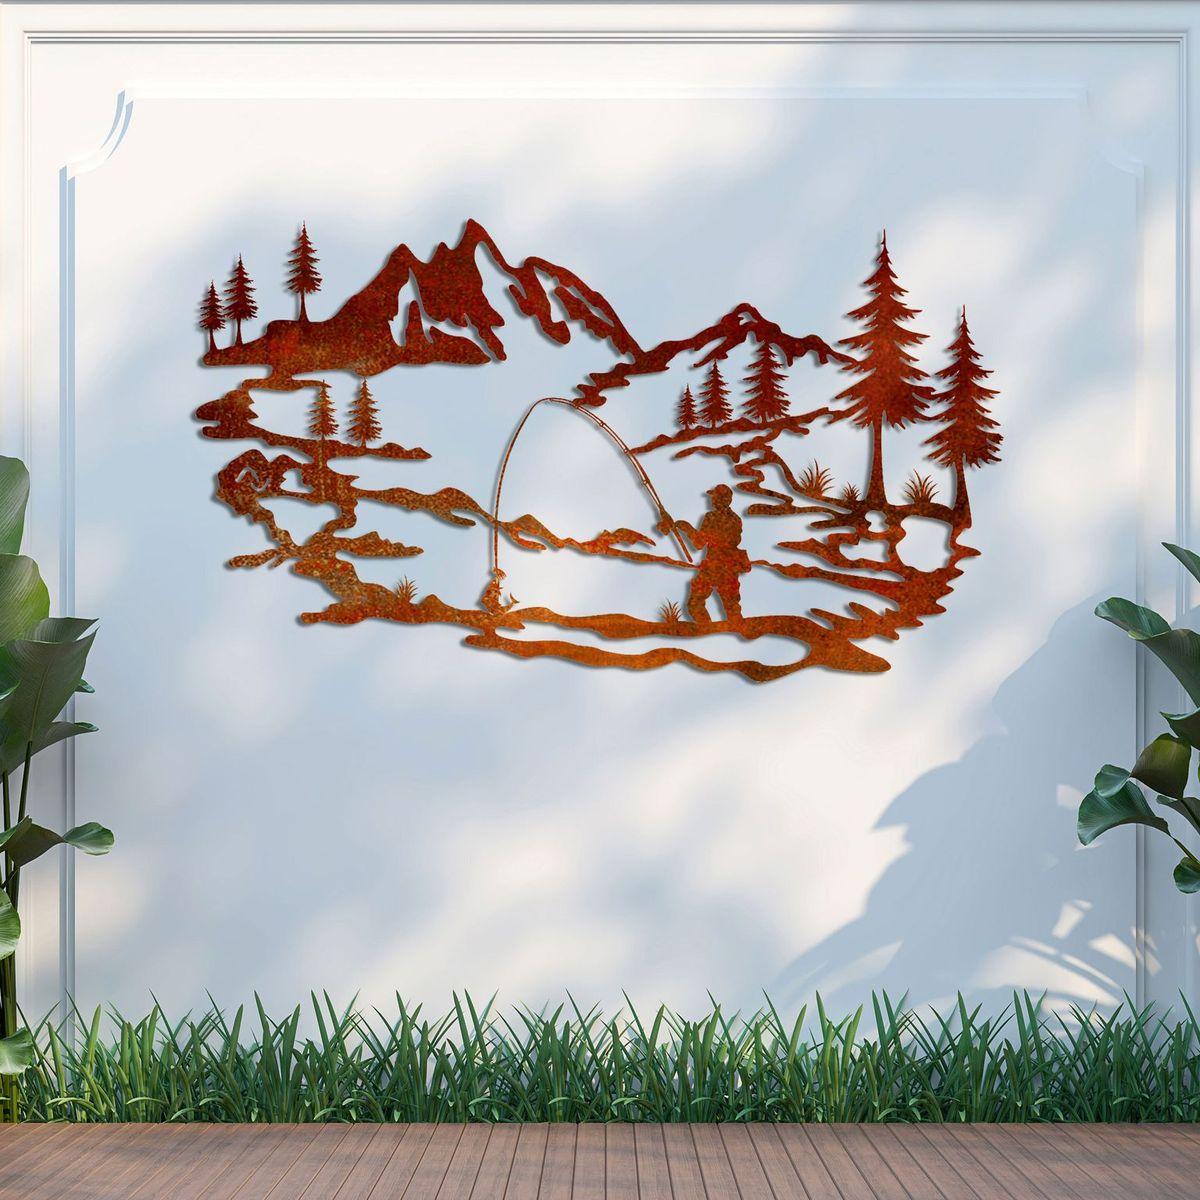 Fishing-metal-garden-art-fence-wall